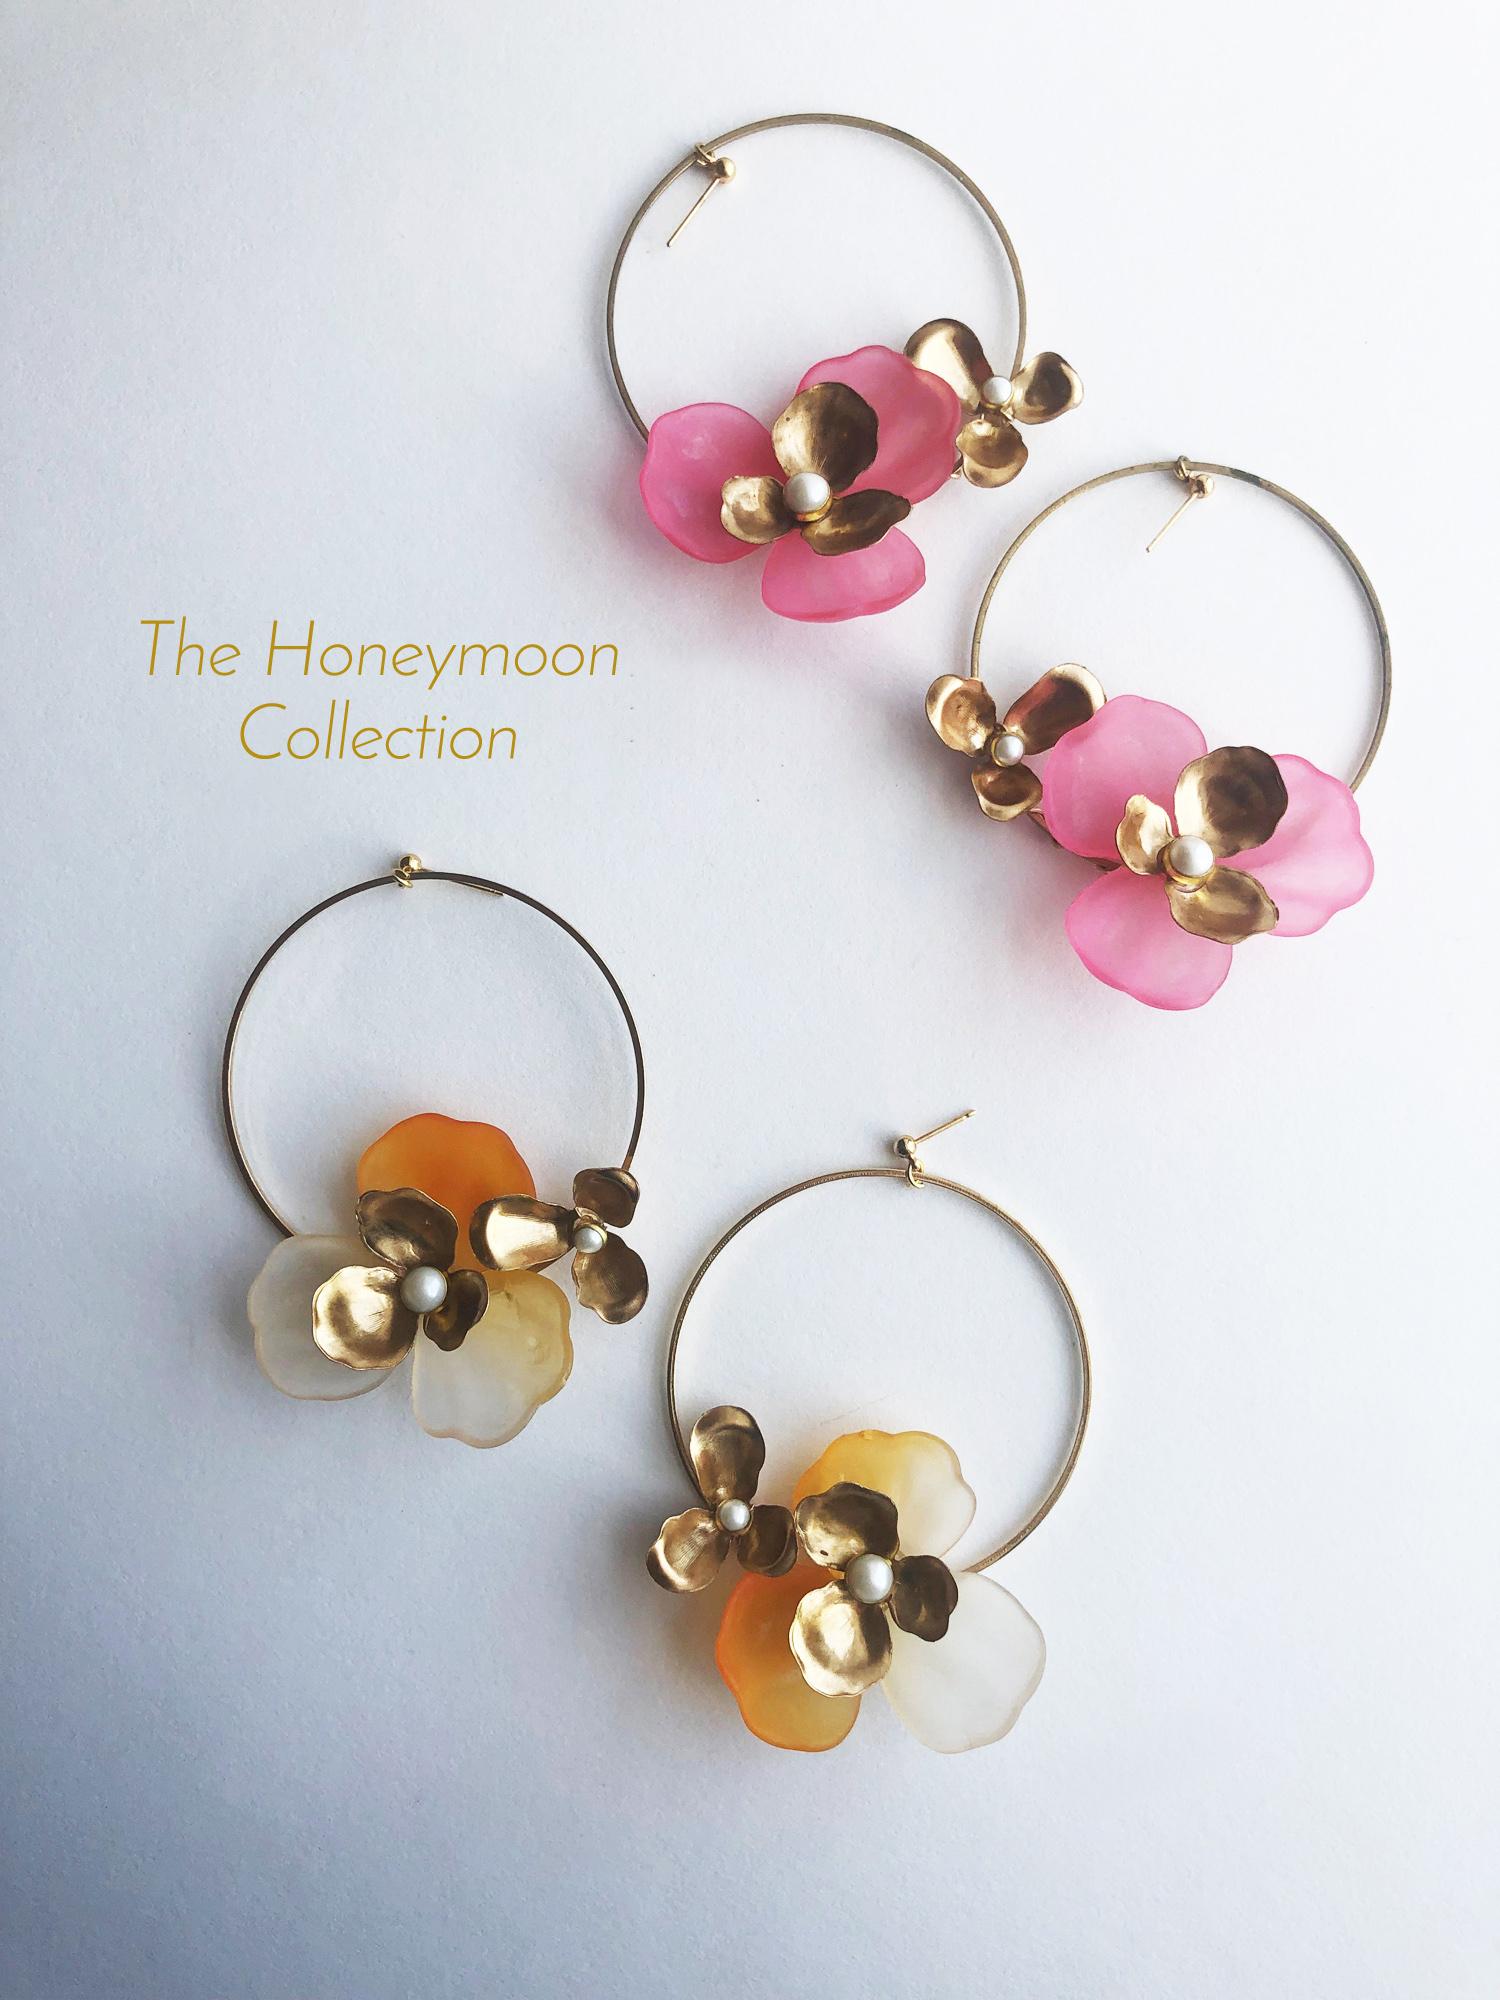 honeymoon collection